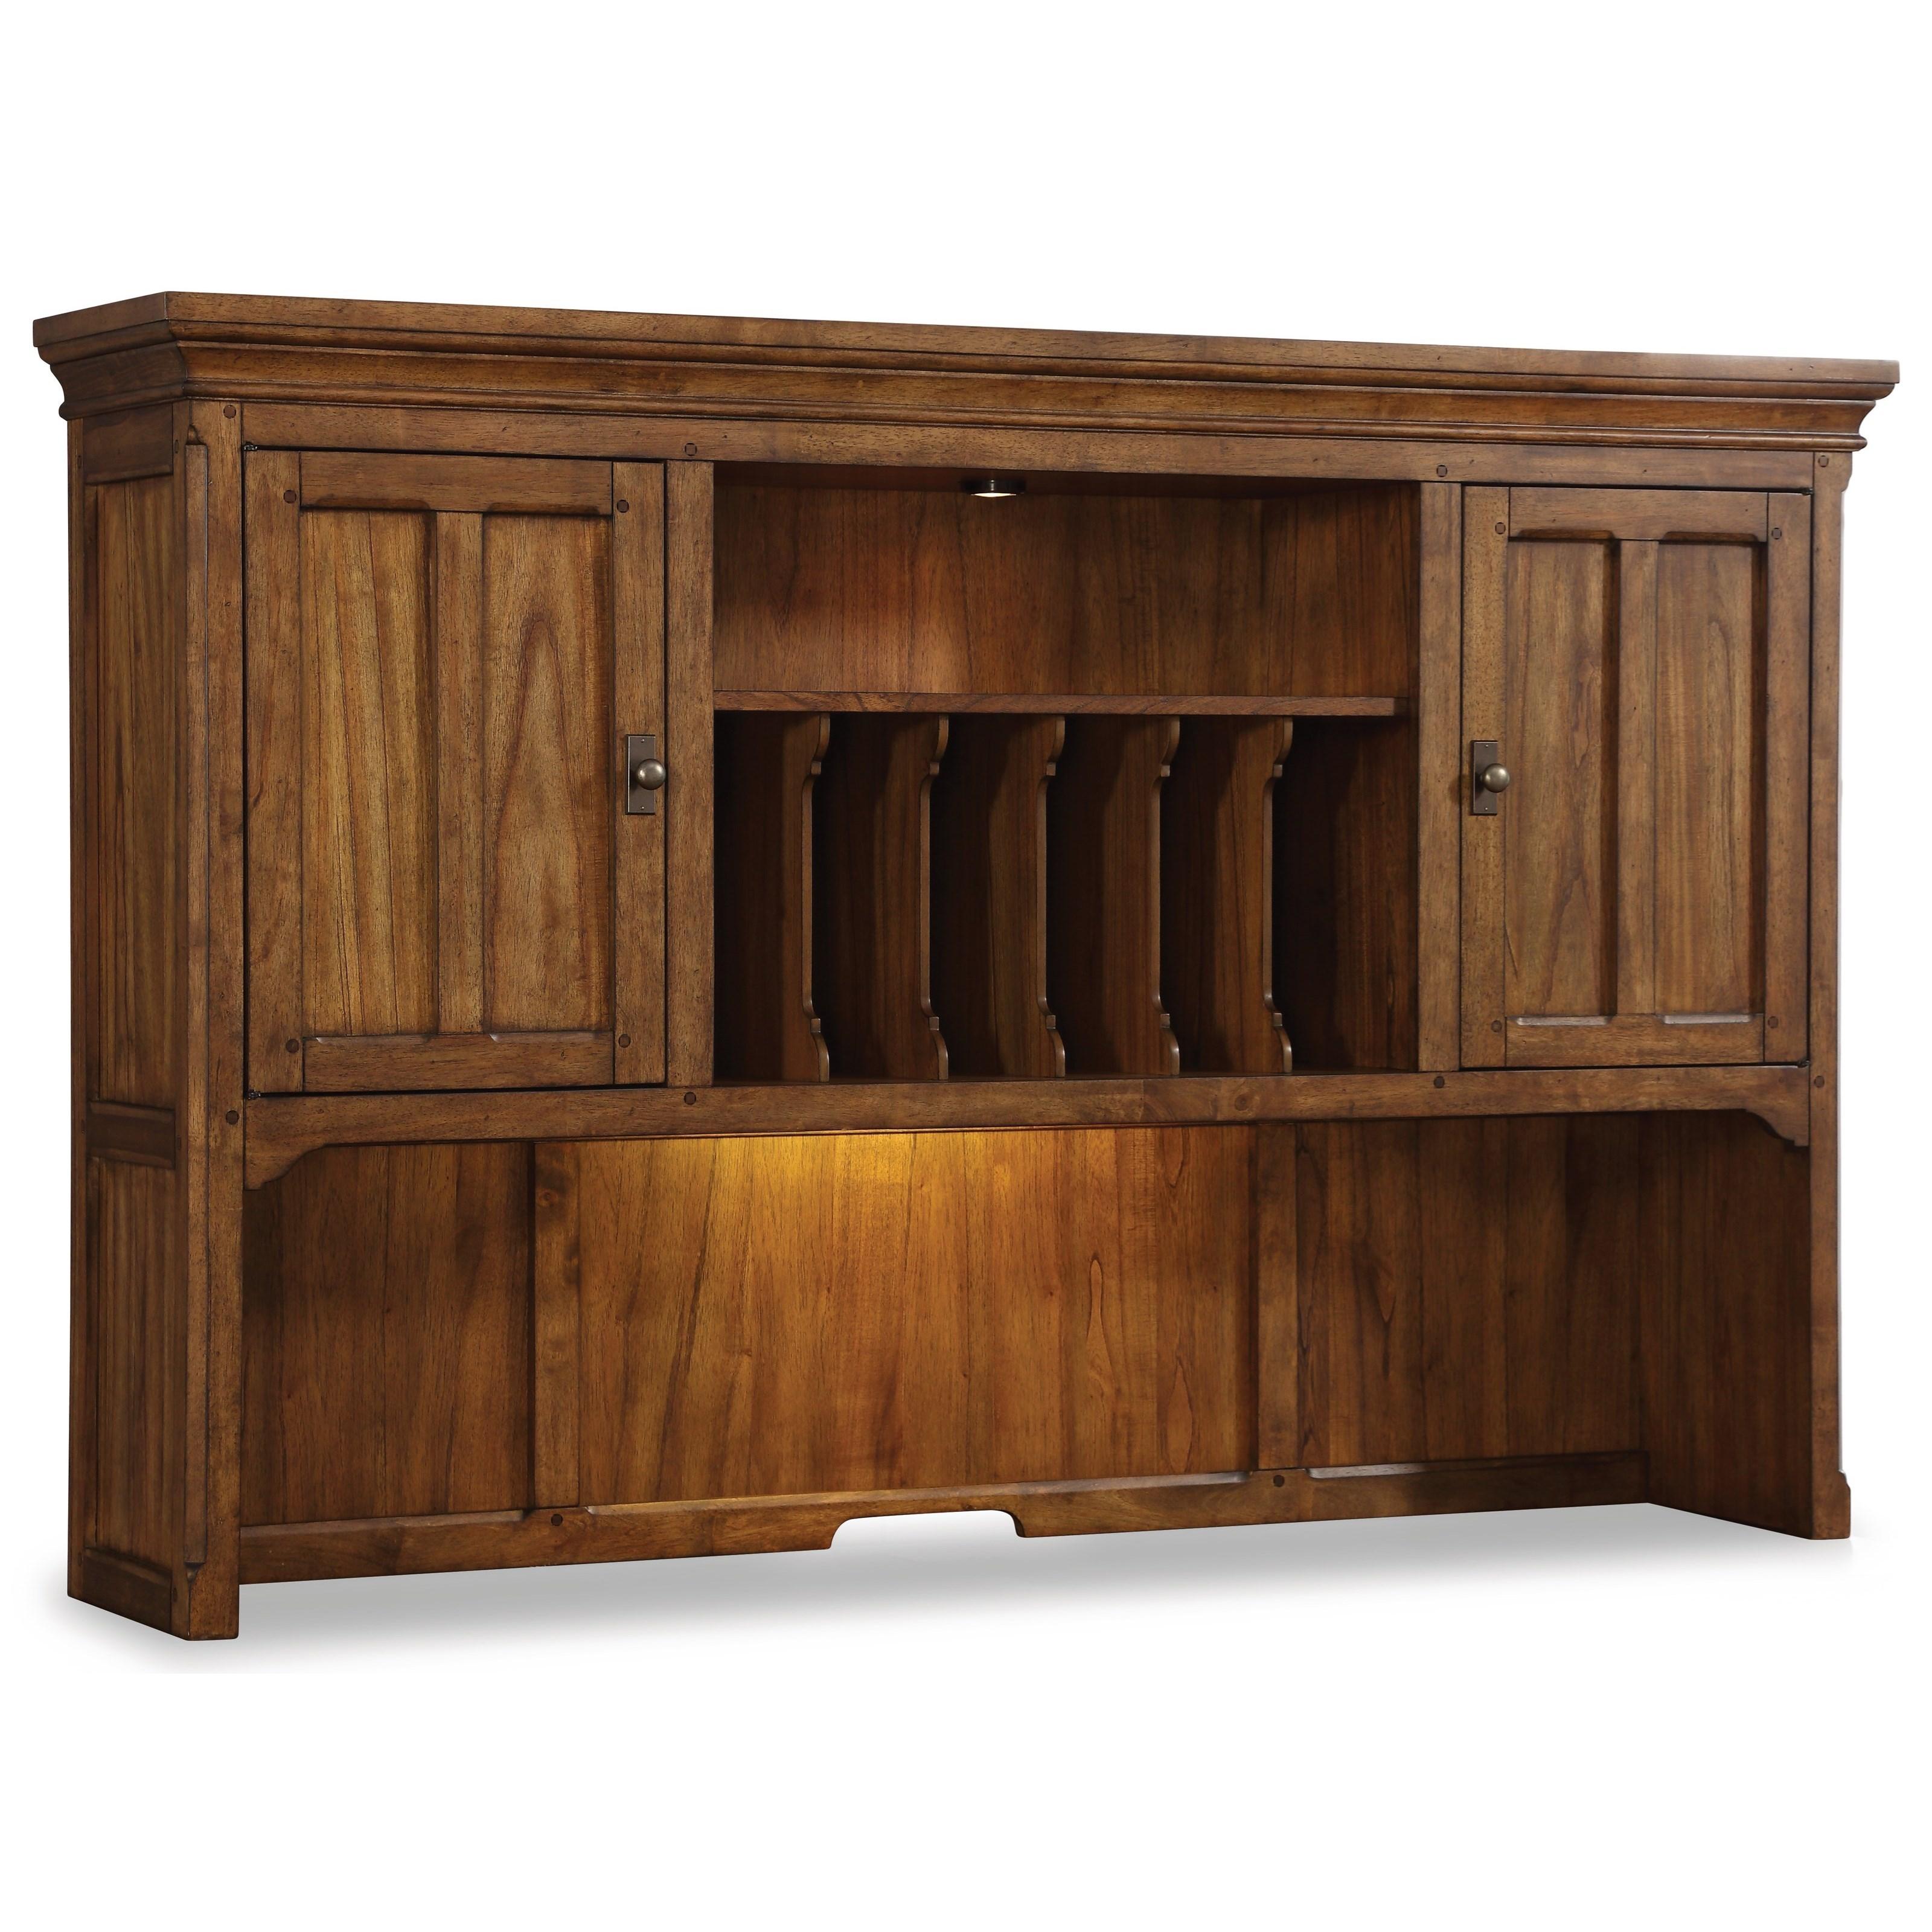 Flexsteel Wynwood Collection Sonora Hutch - Item Number: W1334-744